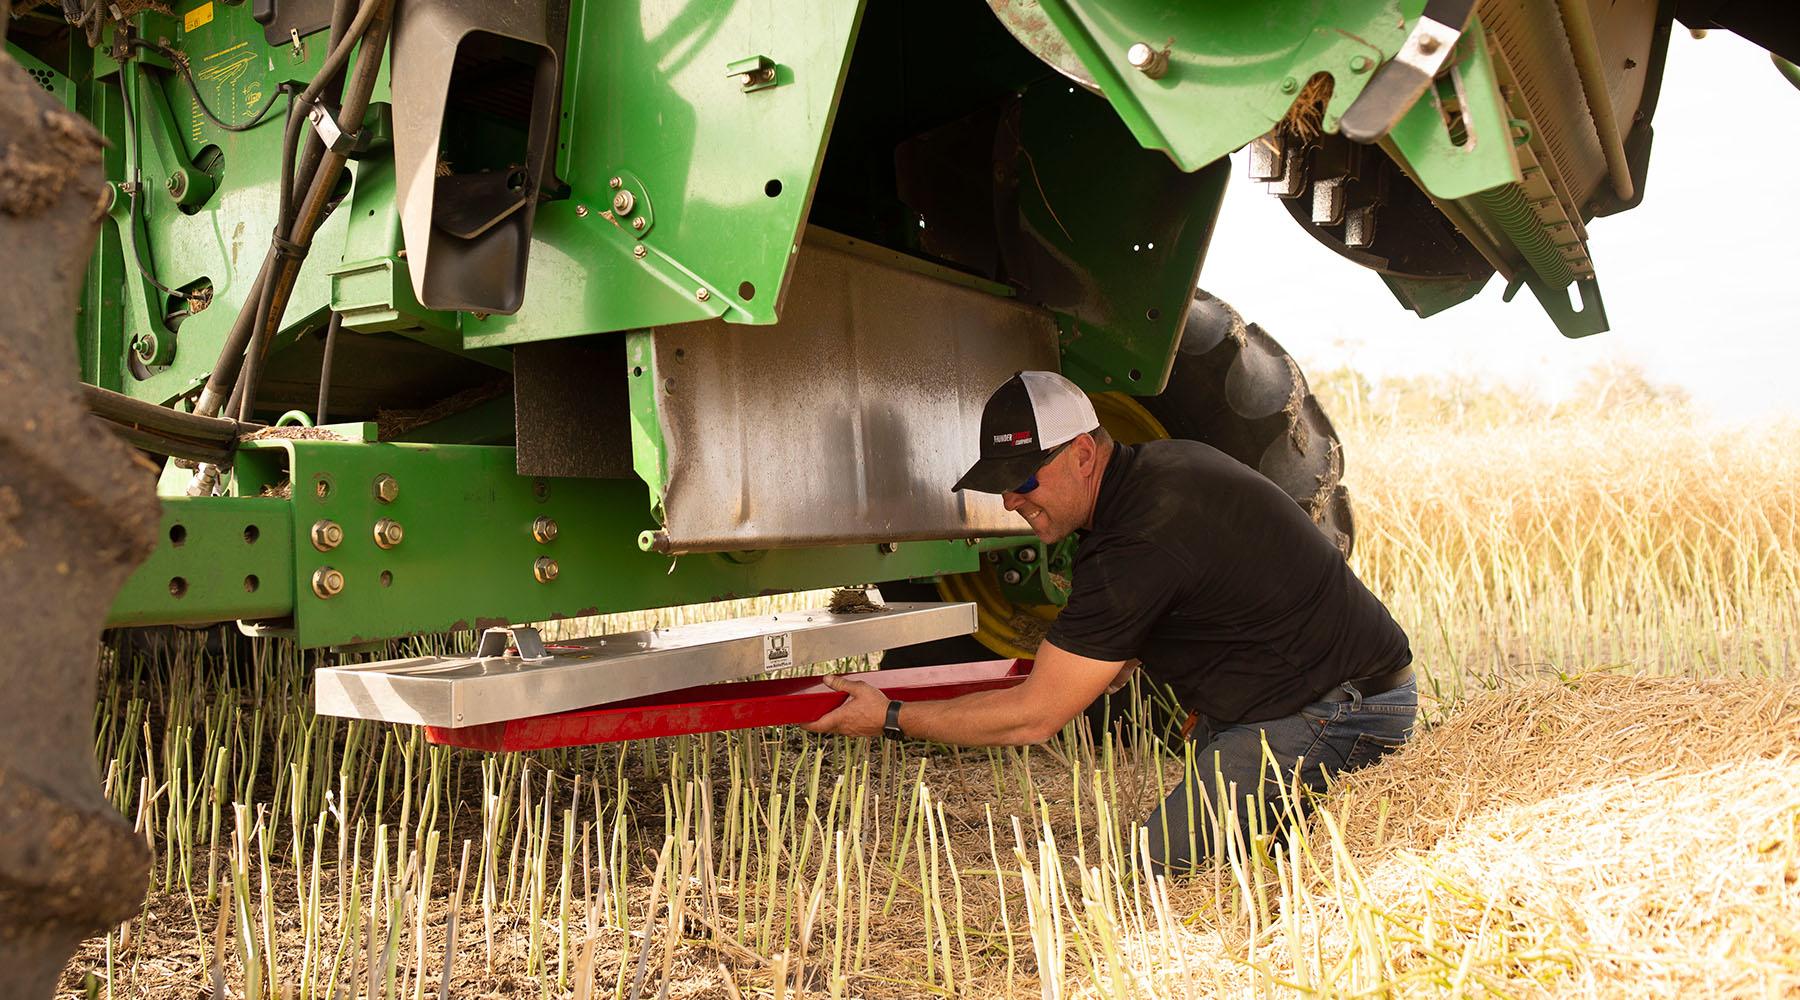 Jeremy installing equipment